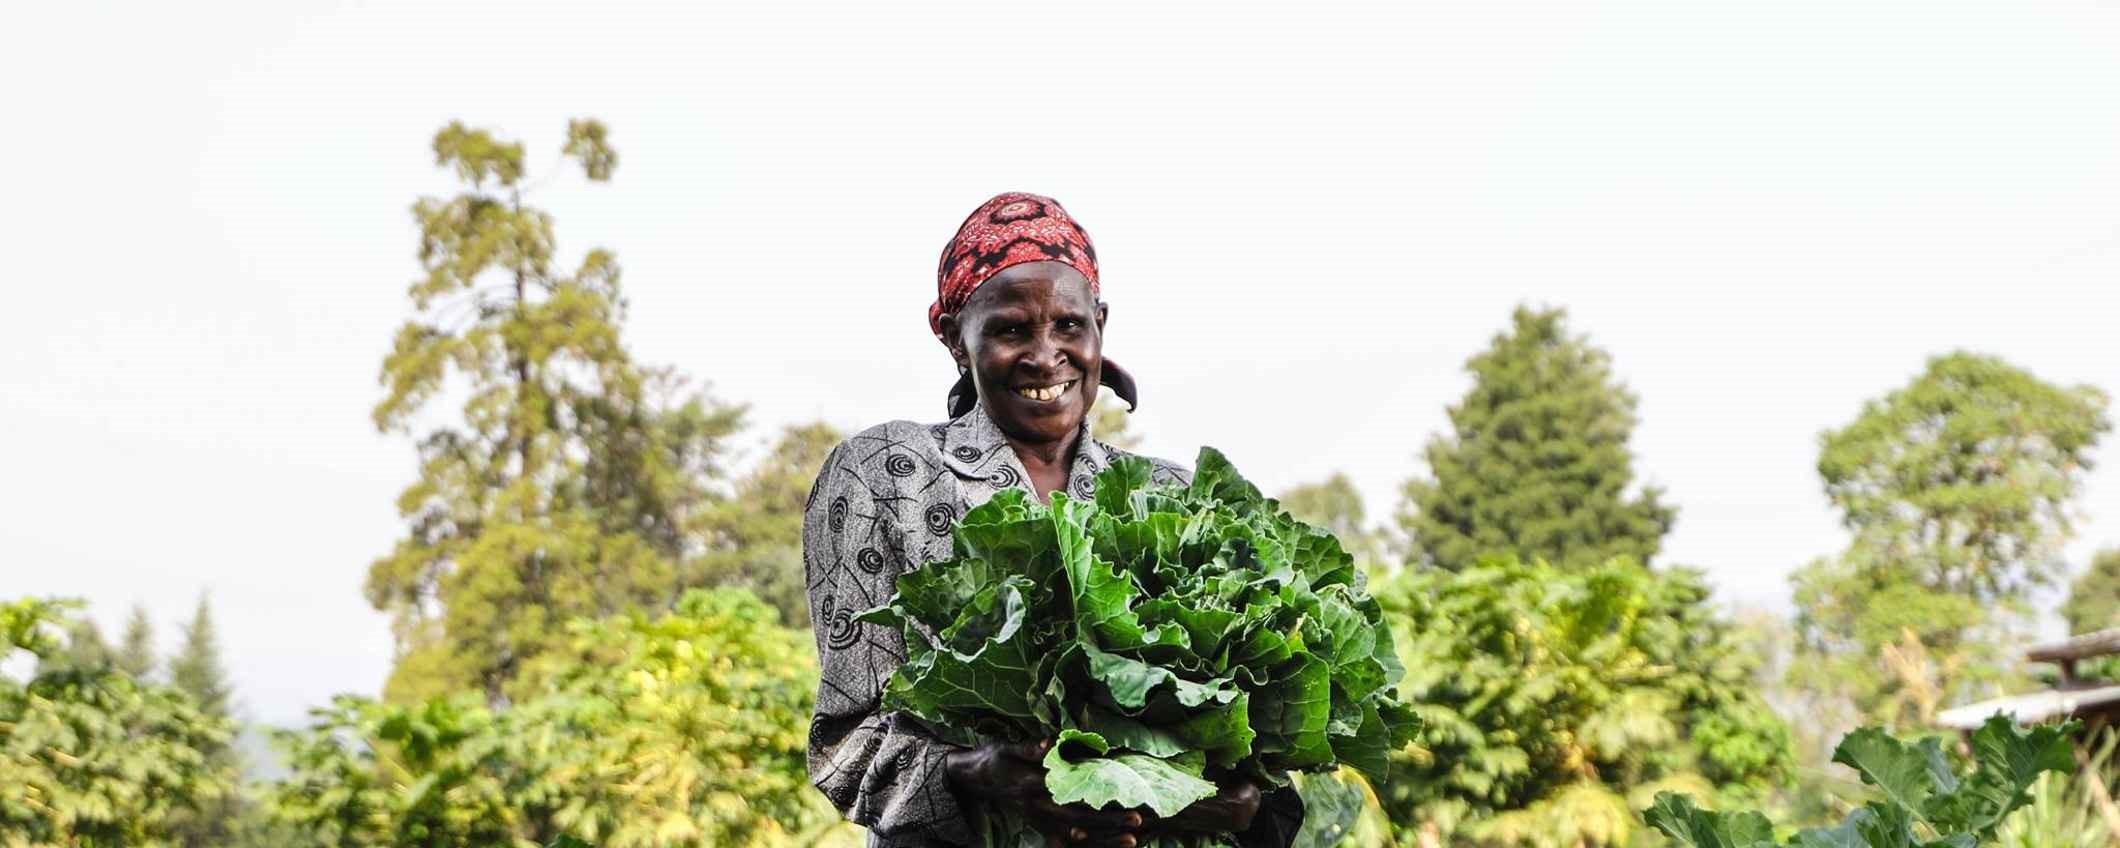 Green enterpreneurship